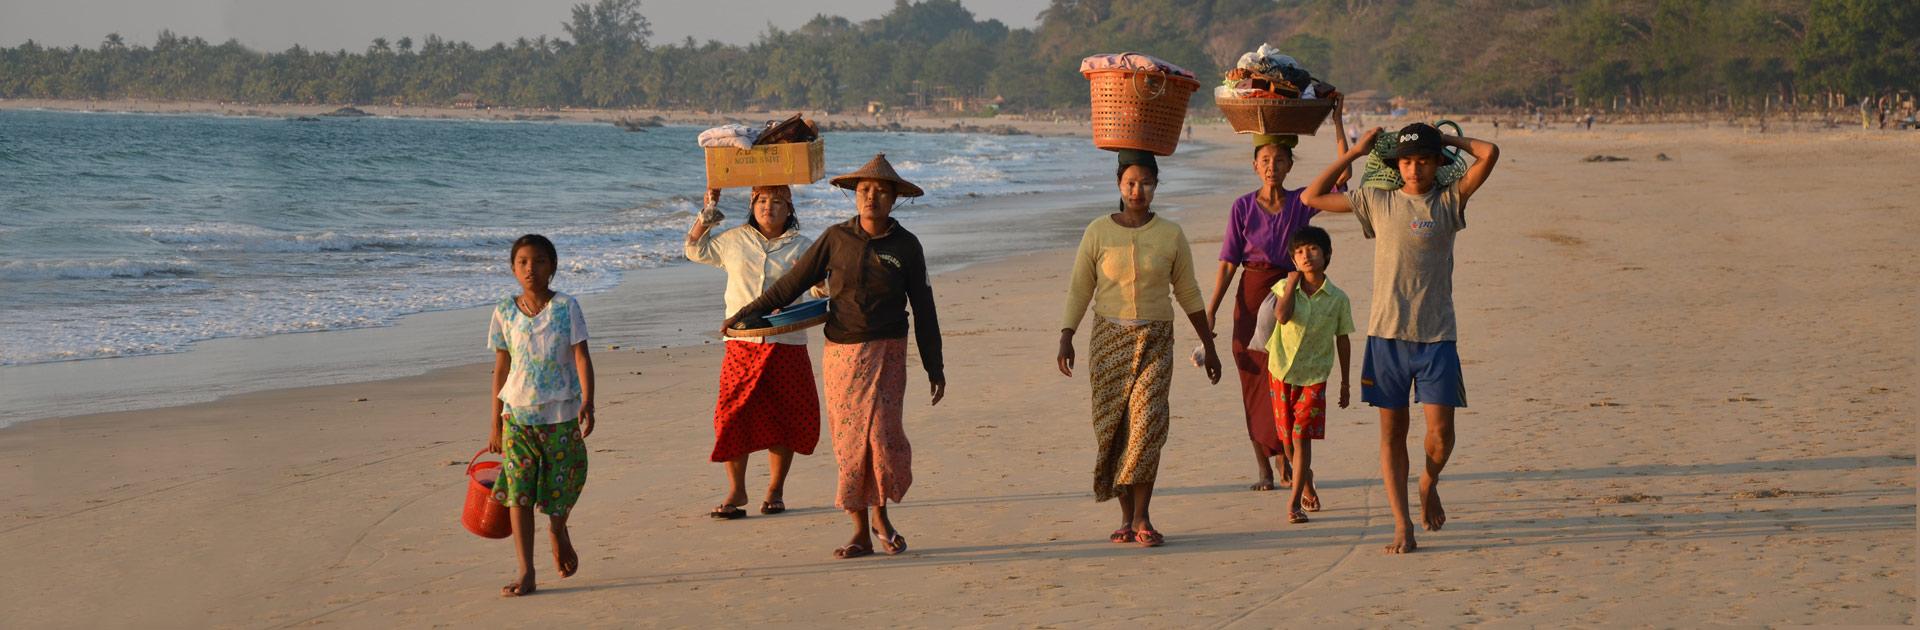 MM Myanmar Básico y Playa Ngapali 12 días 1